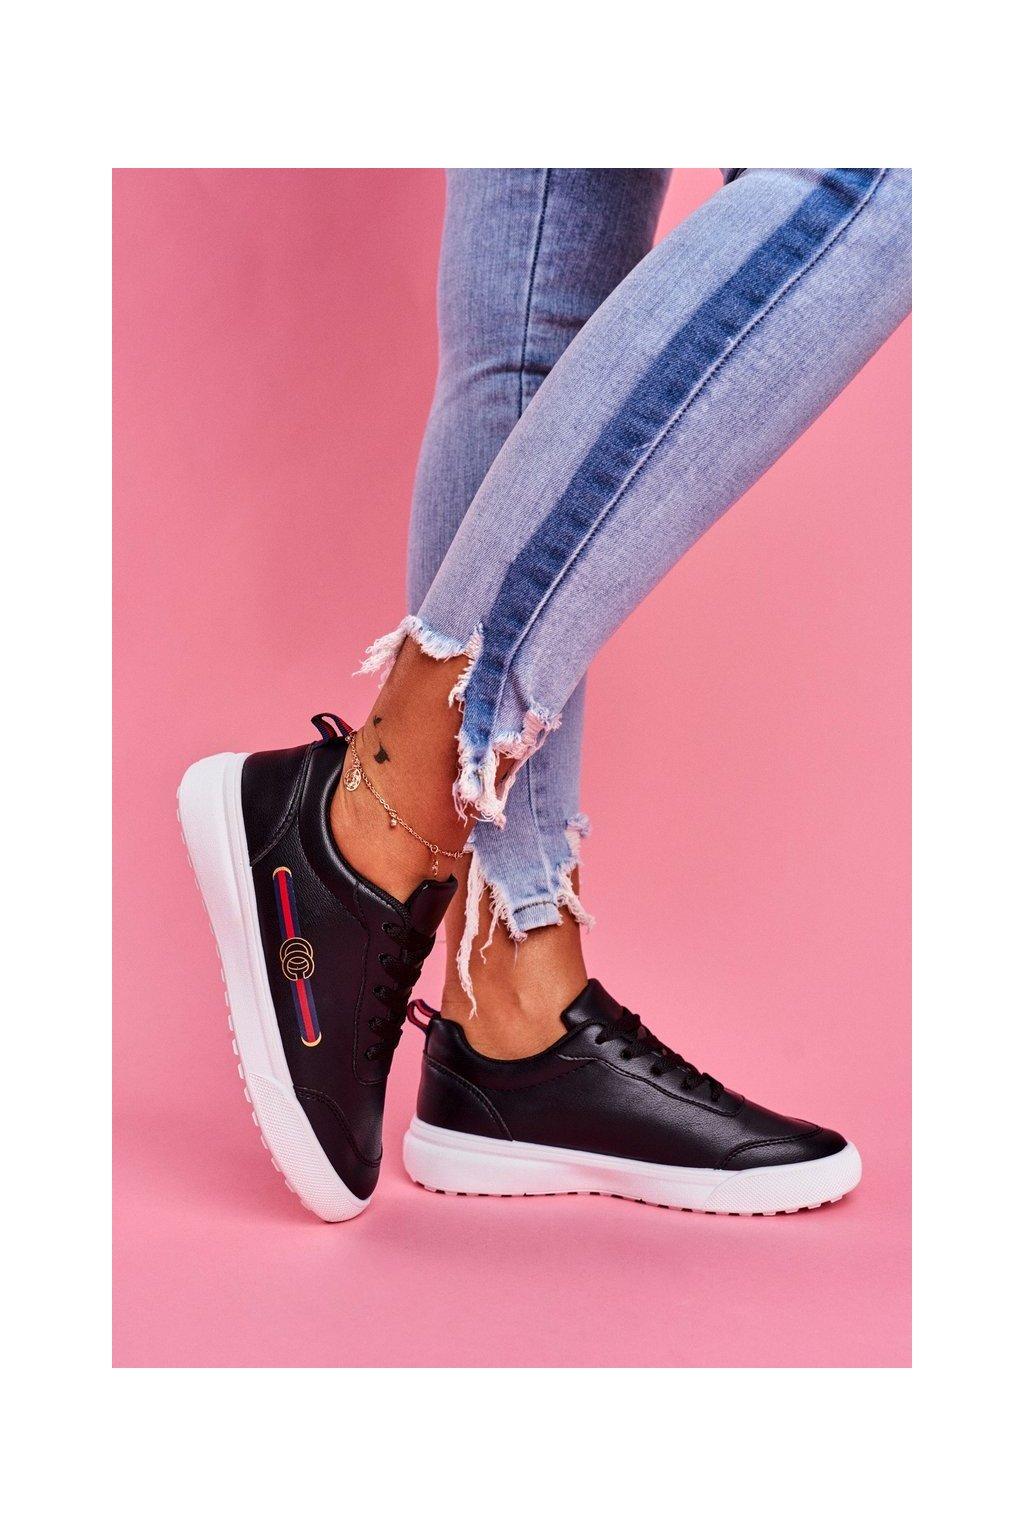 Dámska športová obuv čierna Naomi